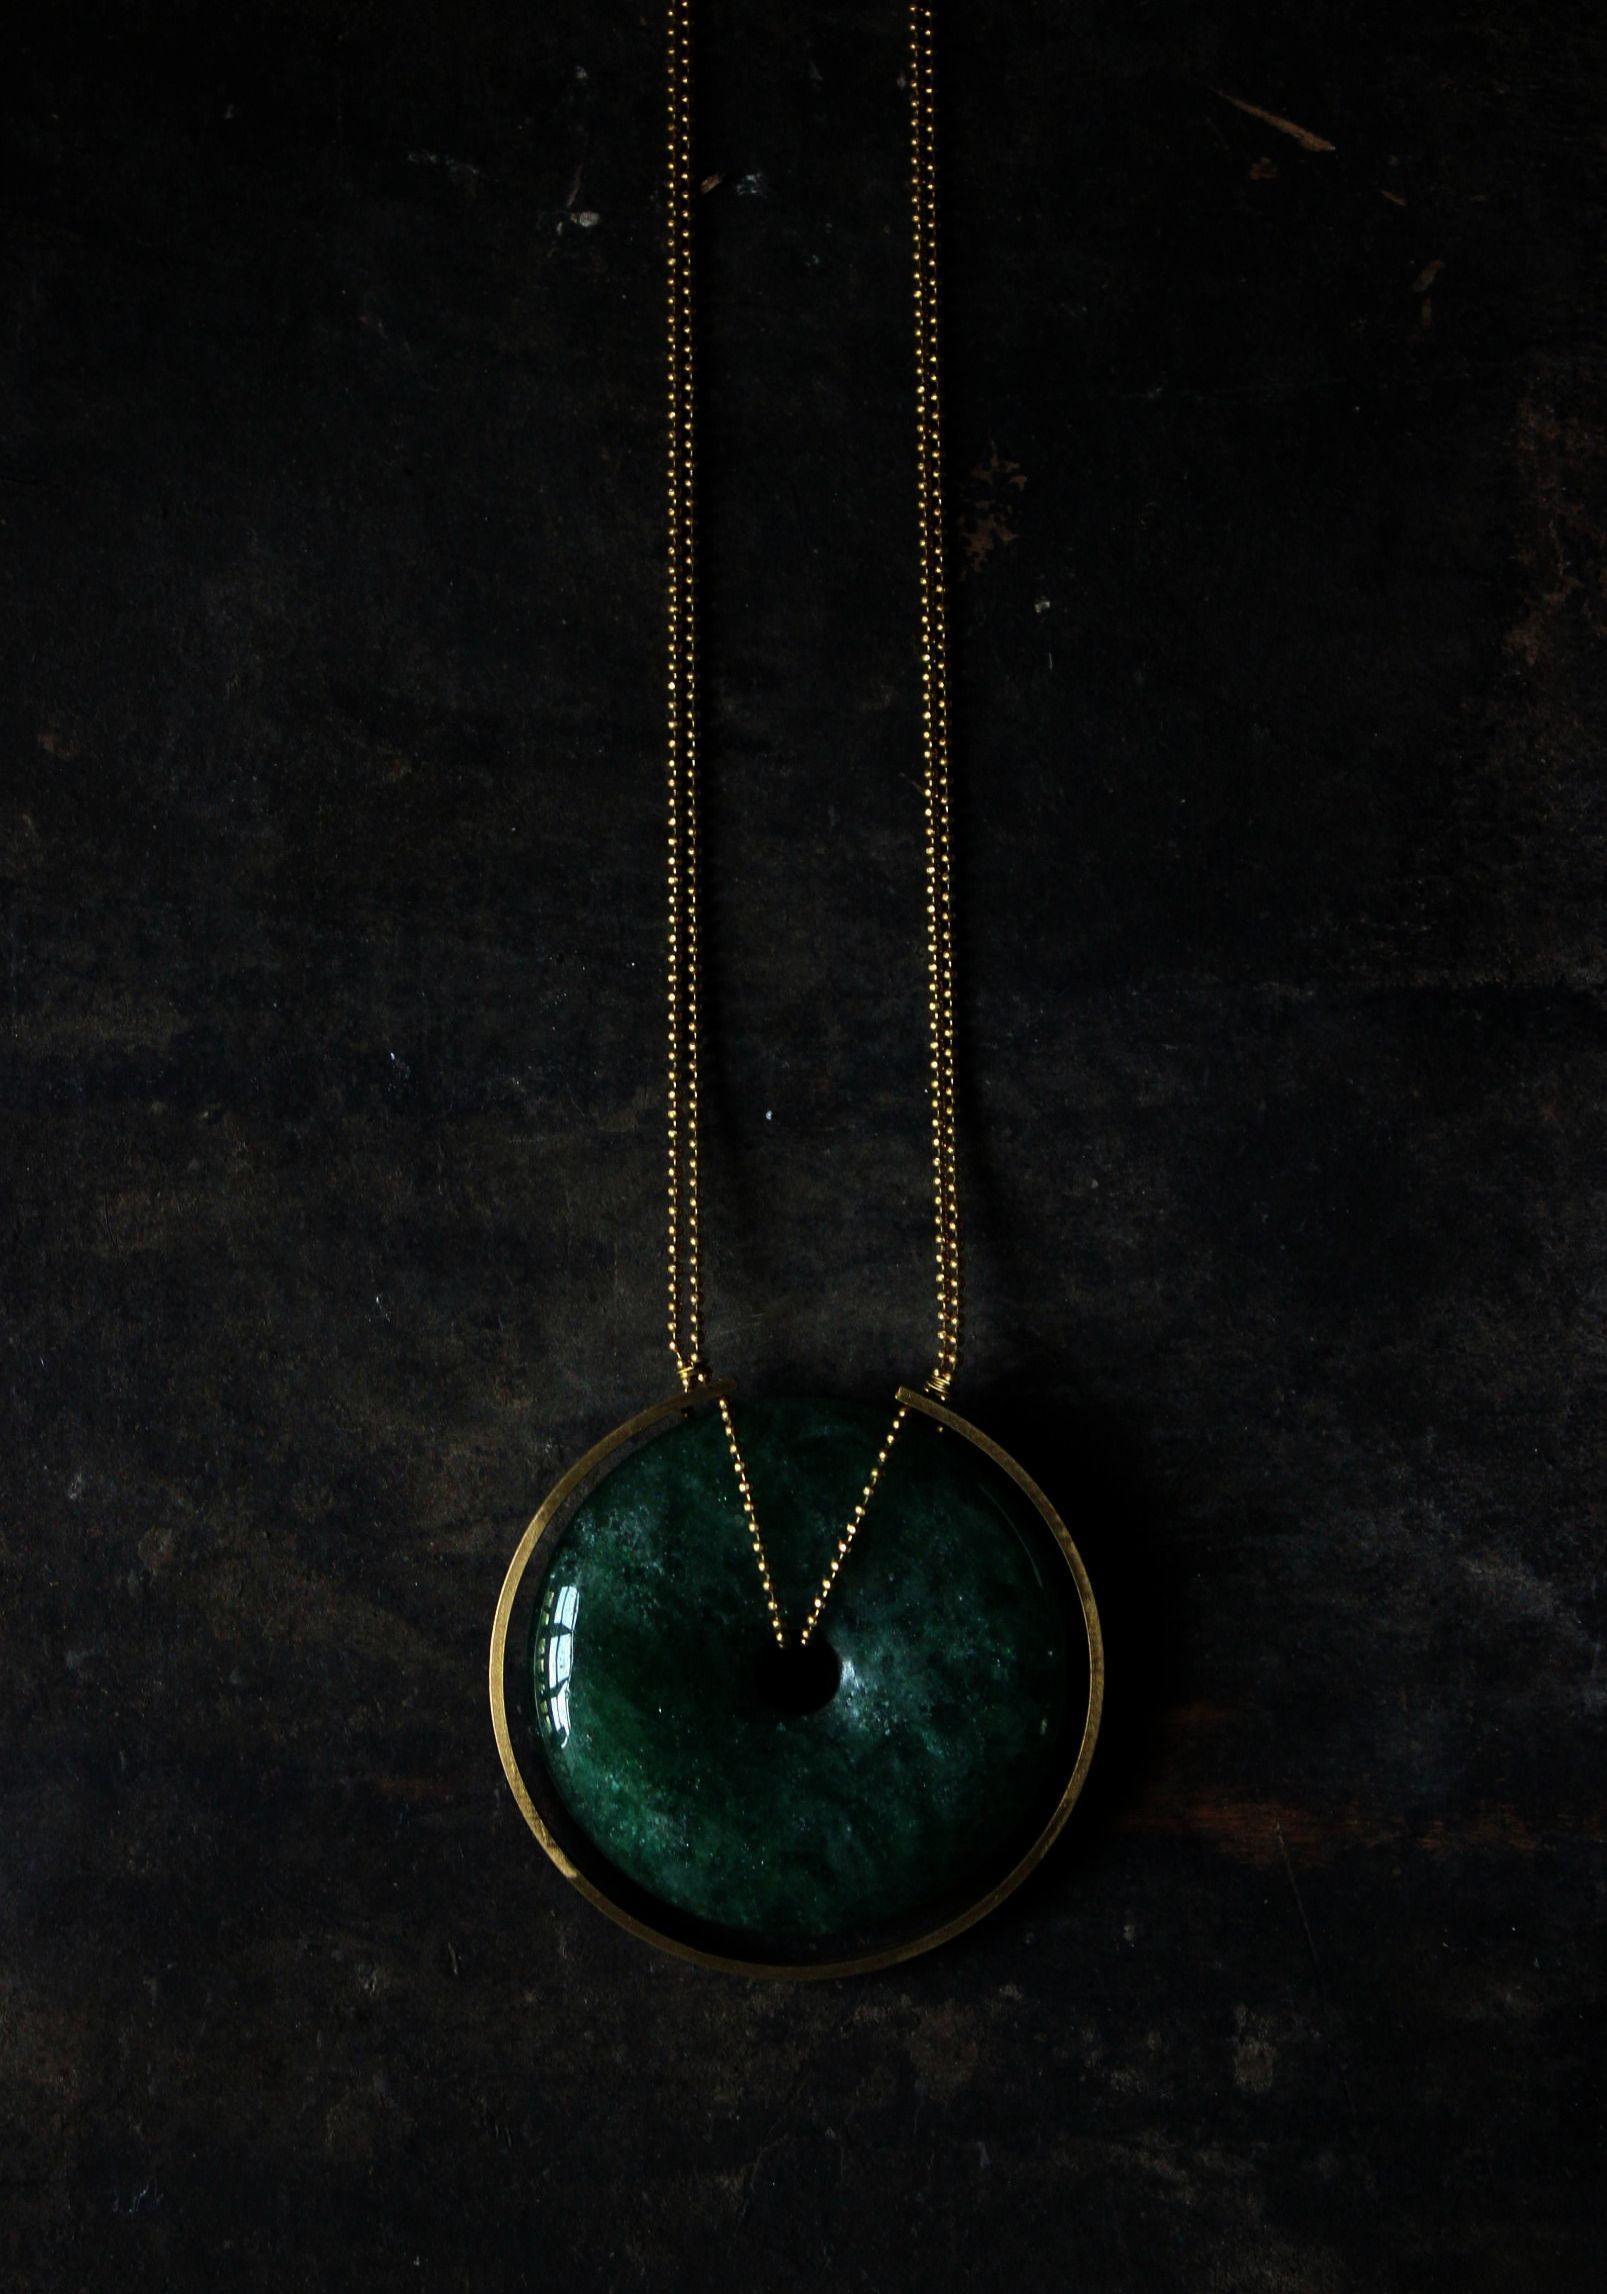 Jewellery Exchange Scarborough Hours. Tanishq Jewellery Exchange Offers this Wav...#exchange #hours #jewellery #offers #scarborough #tanishq #wav